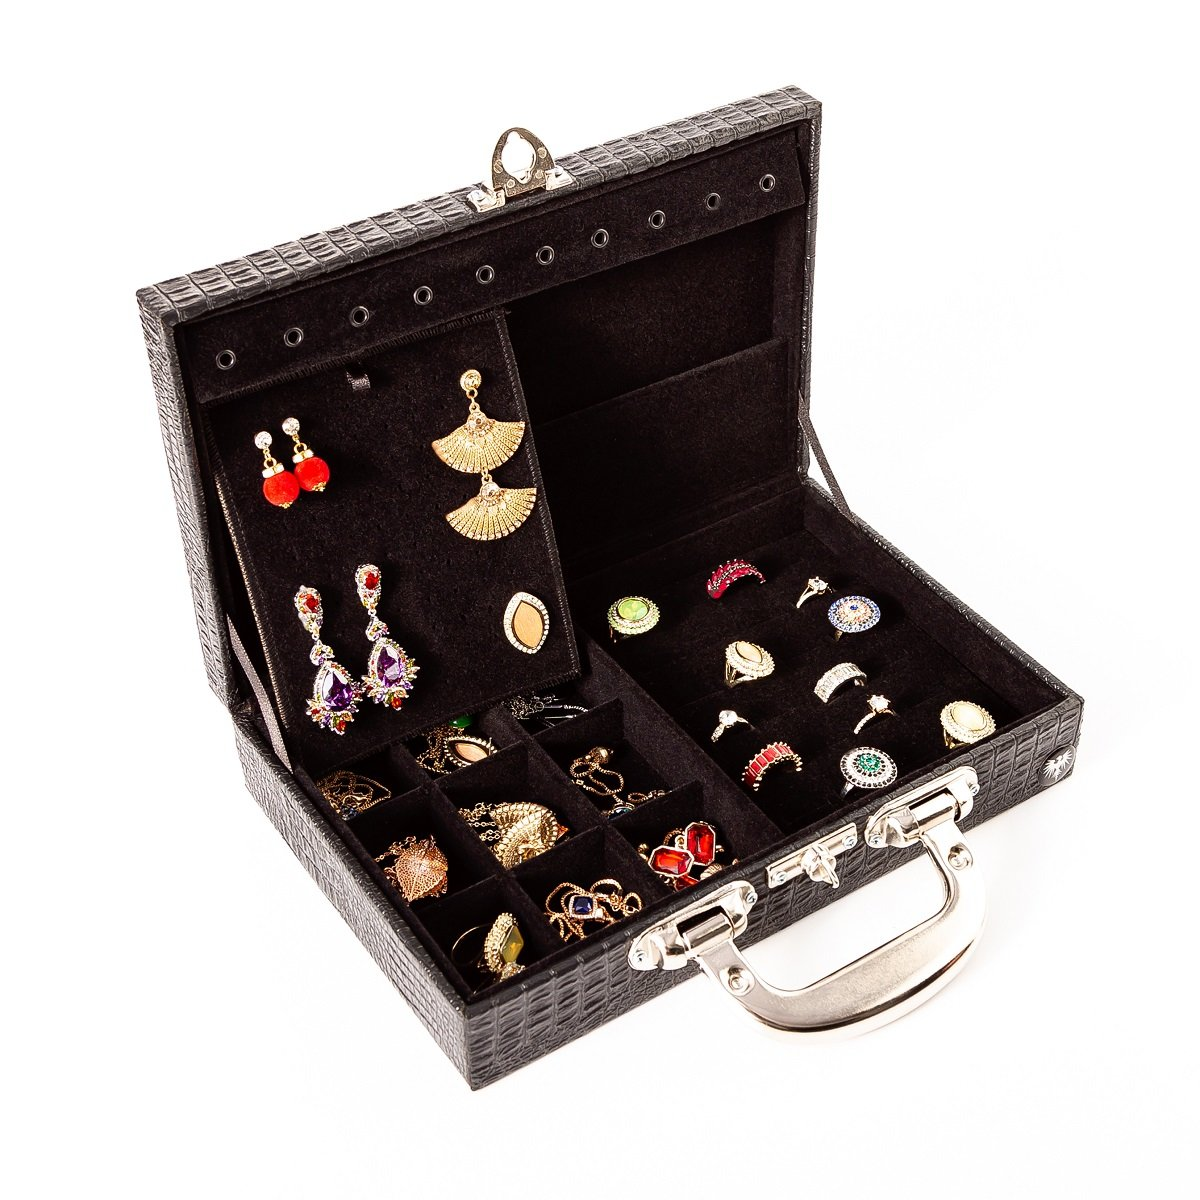 maleta-porta-joias-couro-ecologico-pequeno-preto-preto-imagem-6.jpg